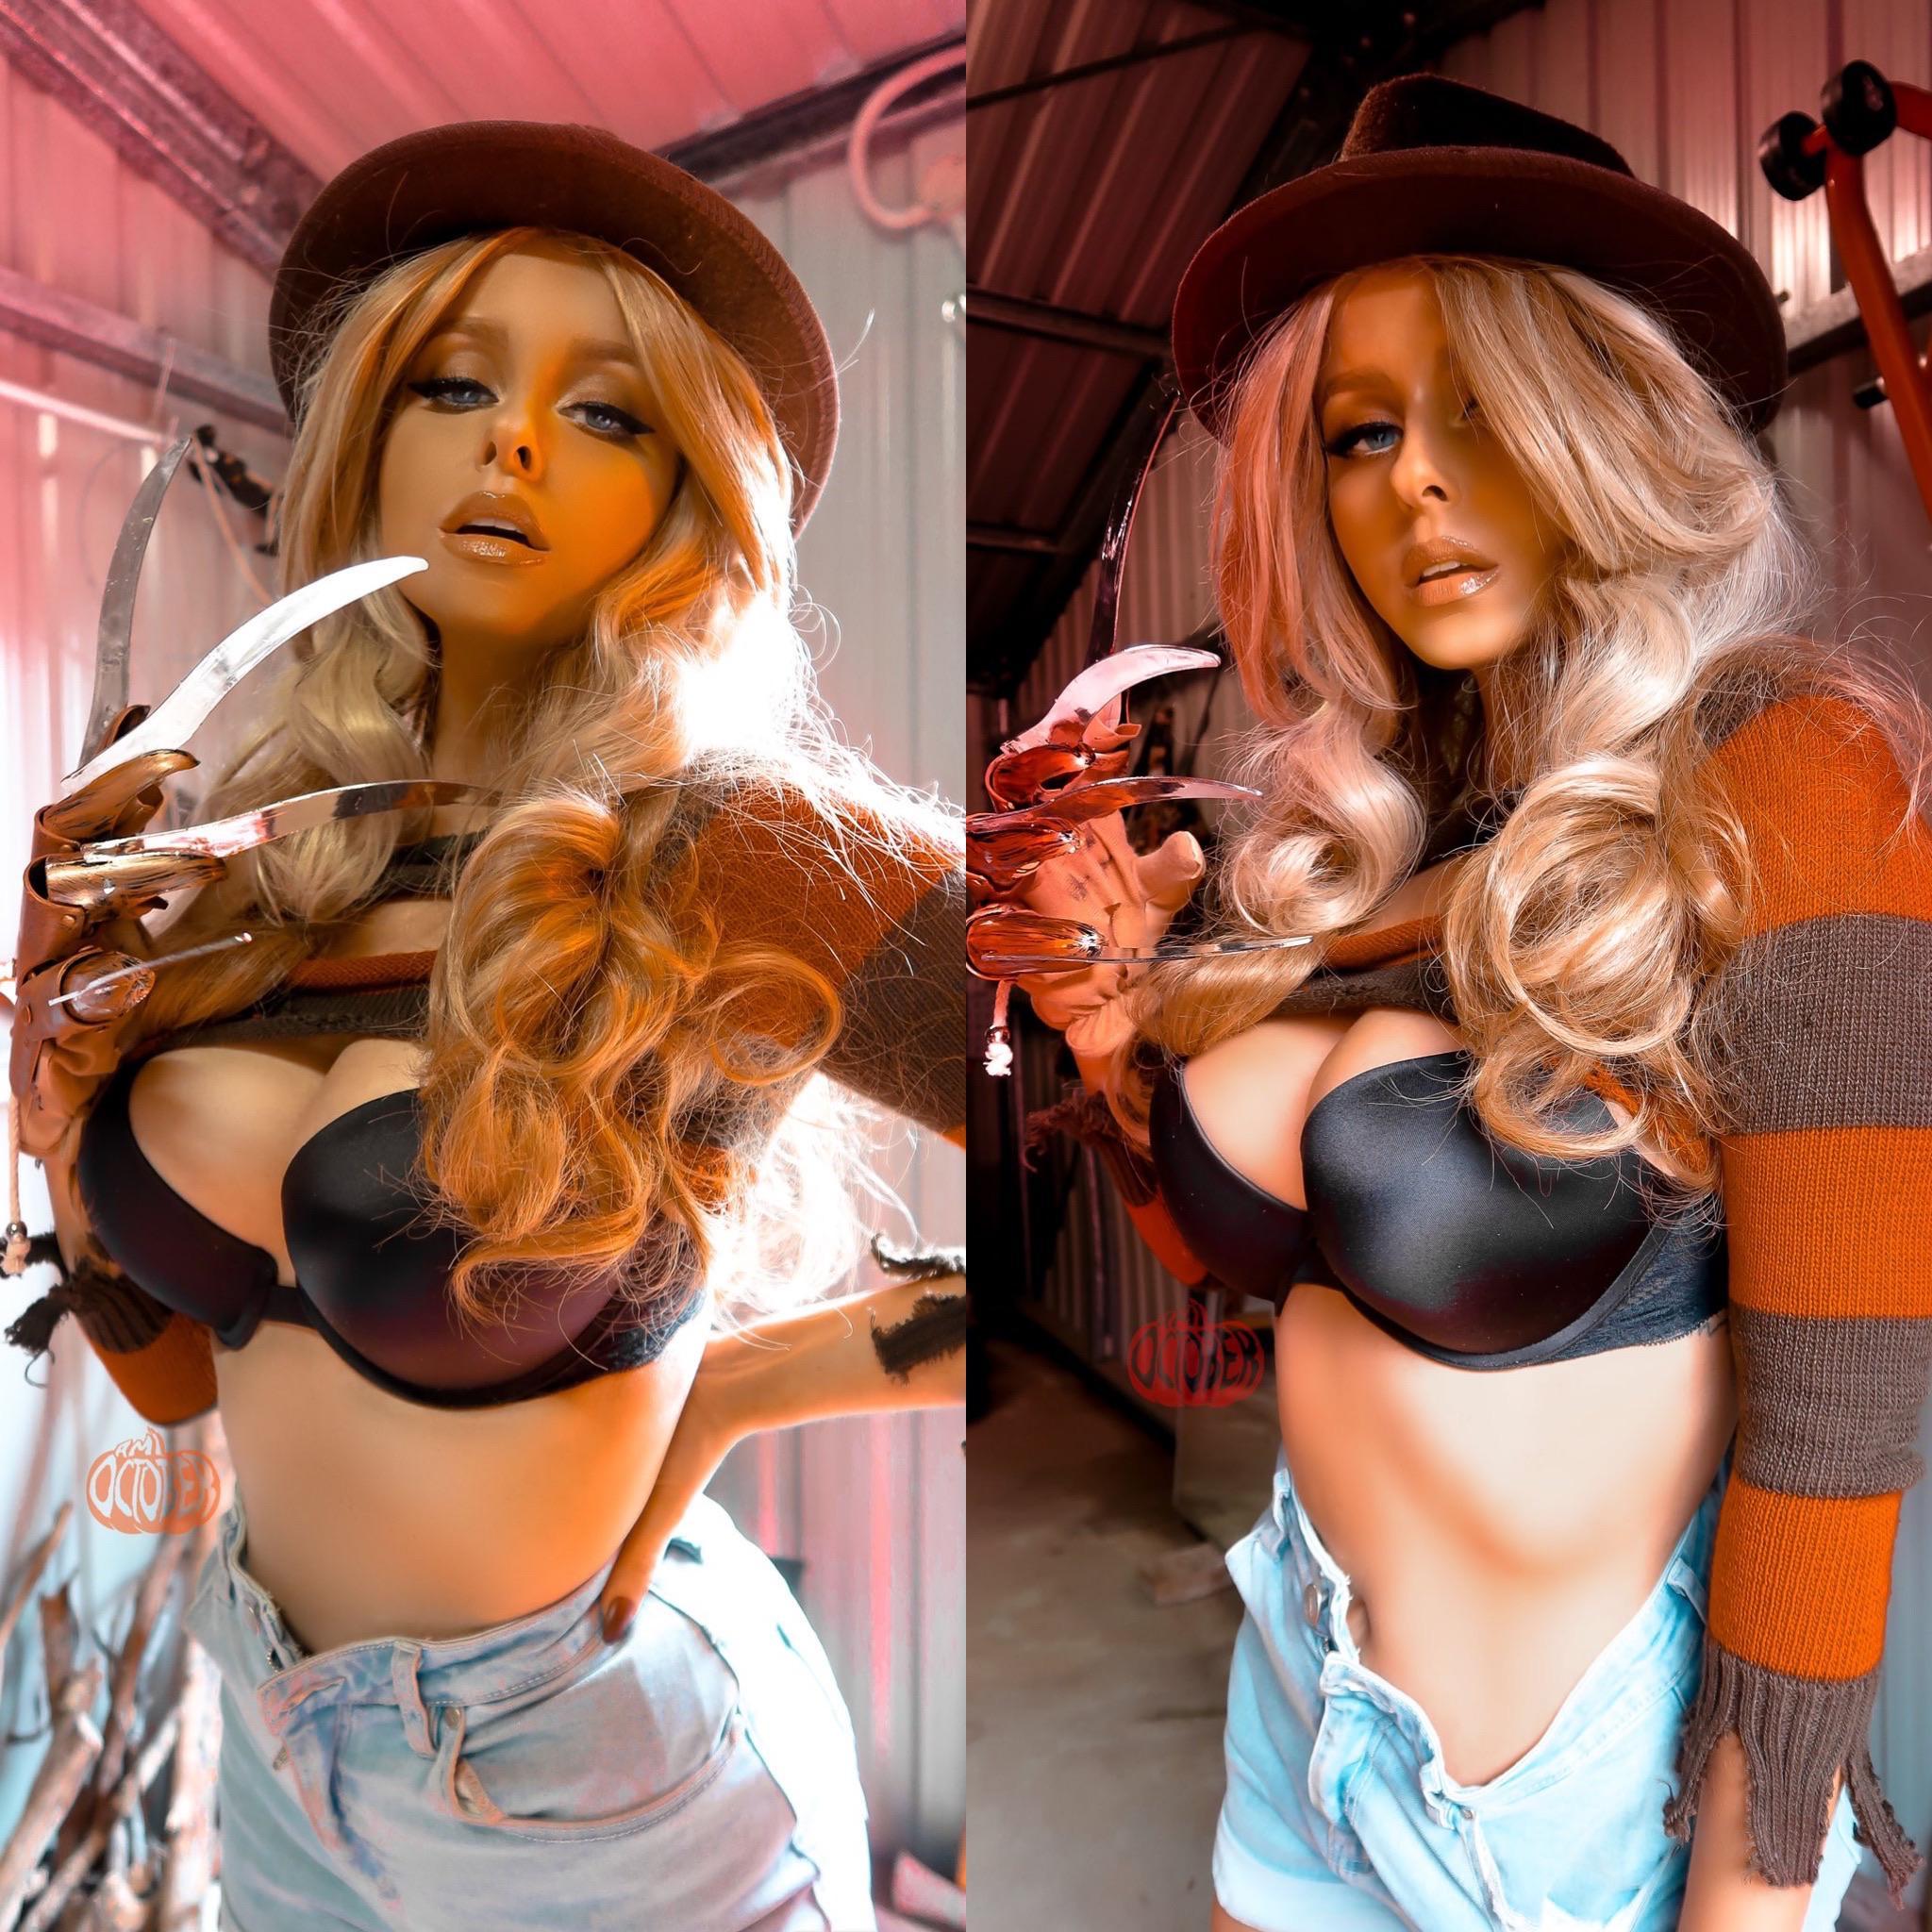 Freddy Kruger By Ami October